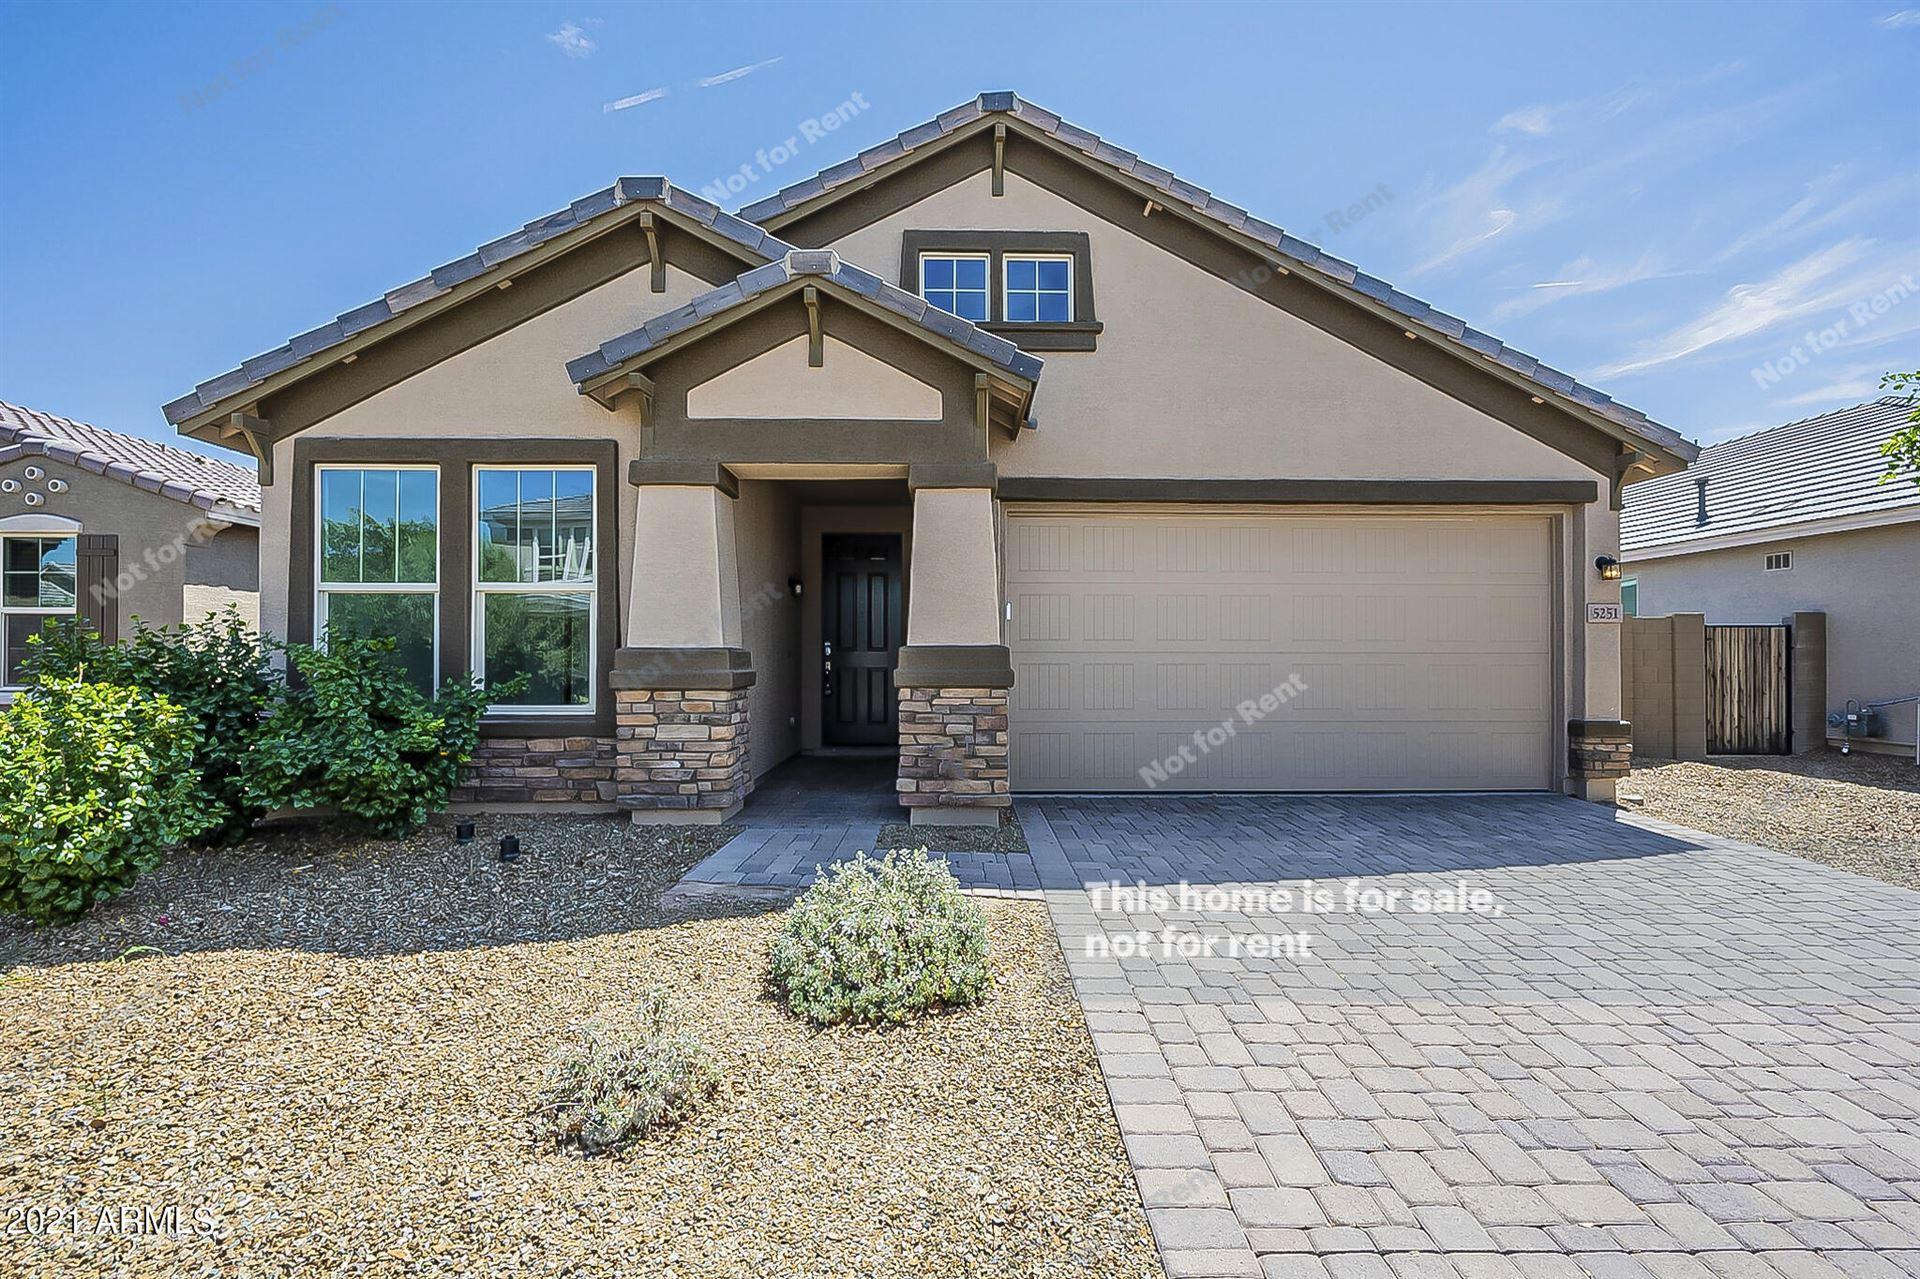 5251 W LEODRA Lane, Laveen, AZ 85339 - MLS#: 6293066